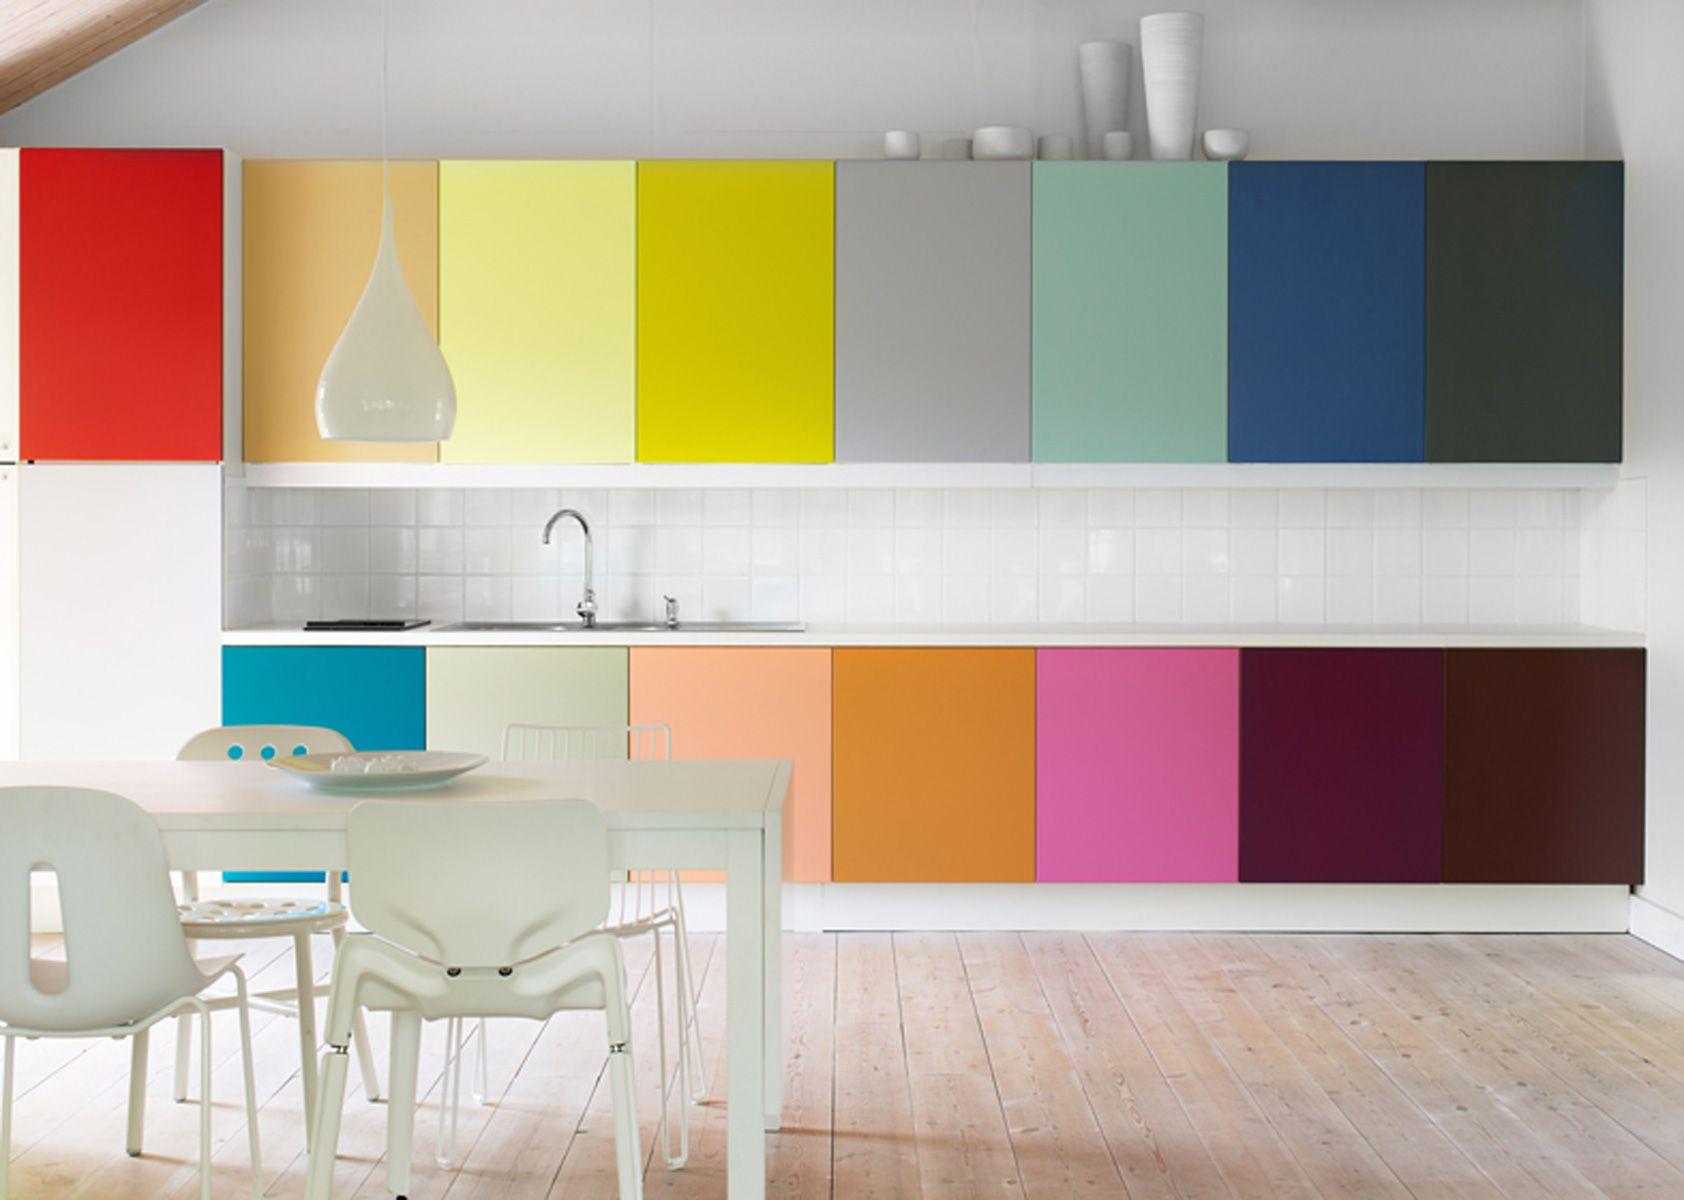 rainbow kitchen cabinets by designer LO BJURULF